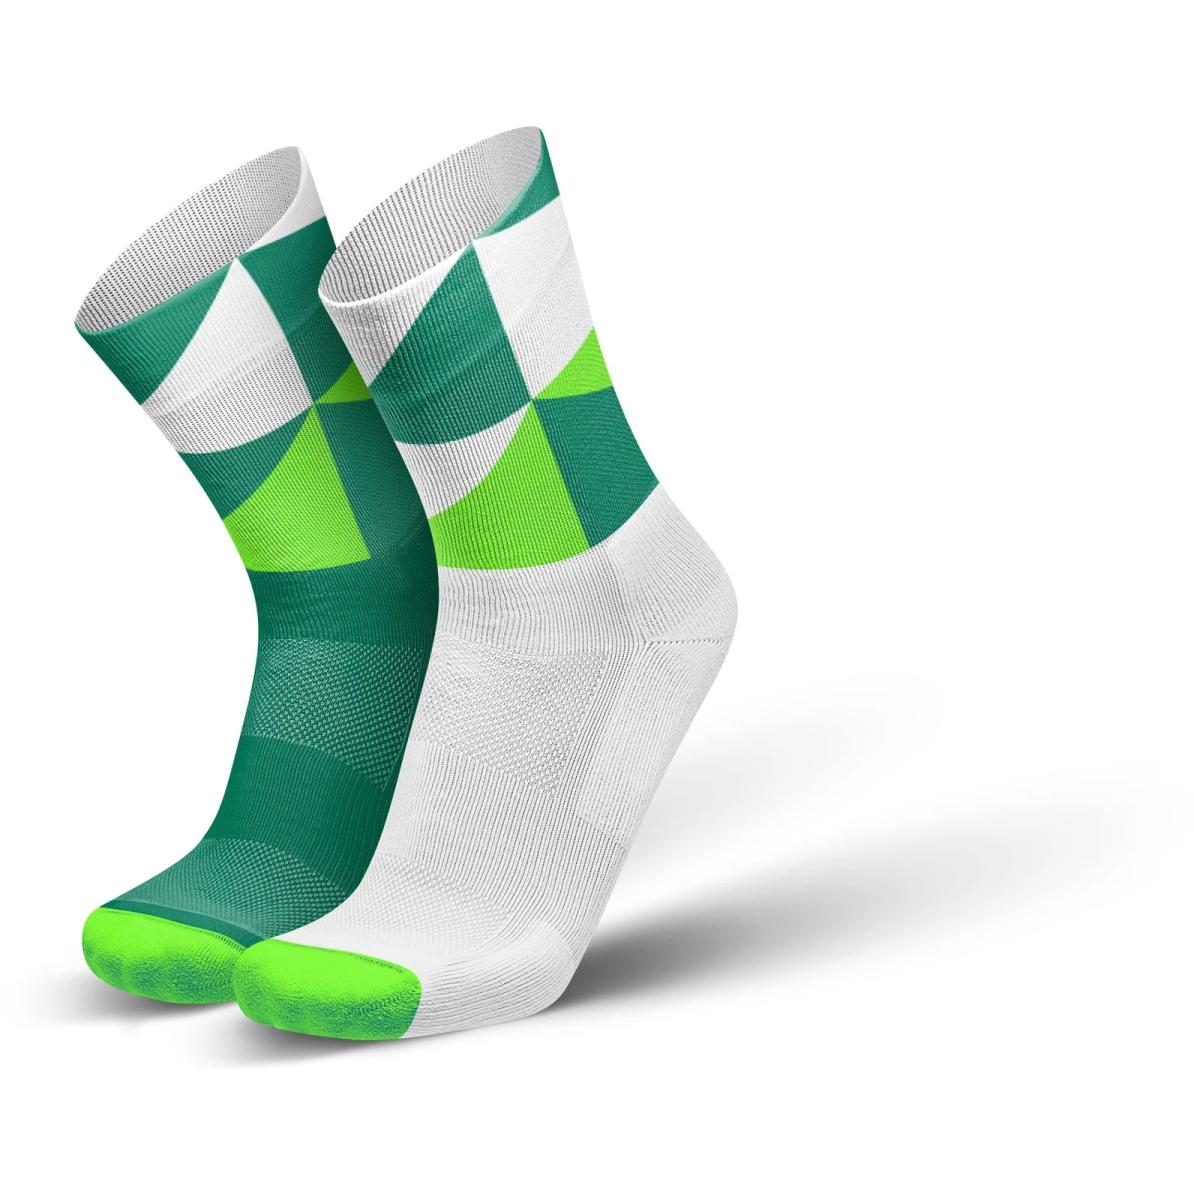 Produktbild von INCYLENCE Running Polygons Socken - Green